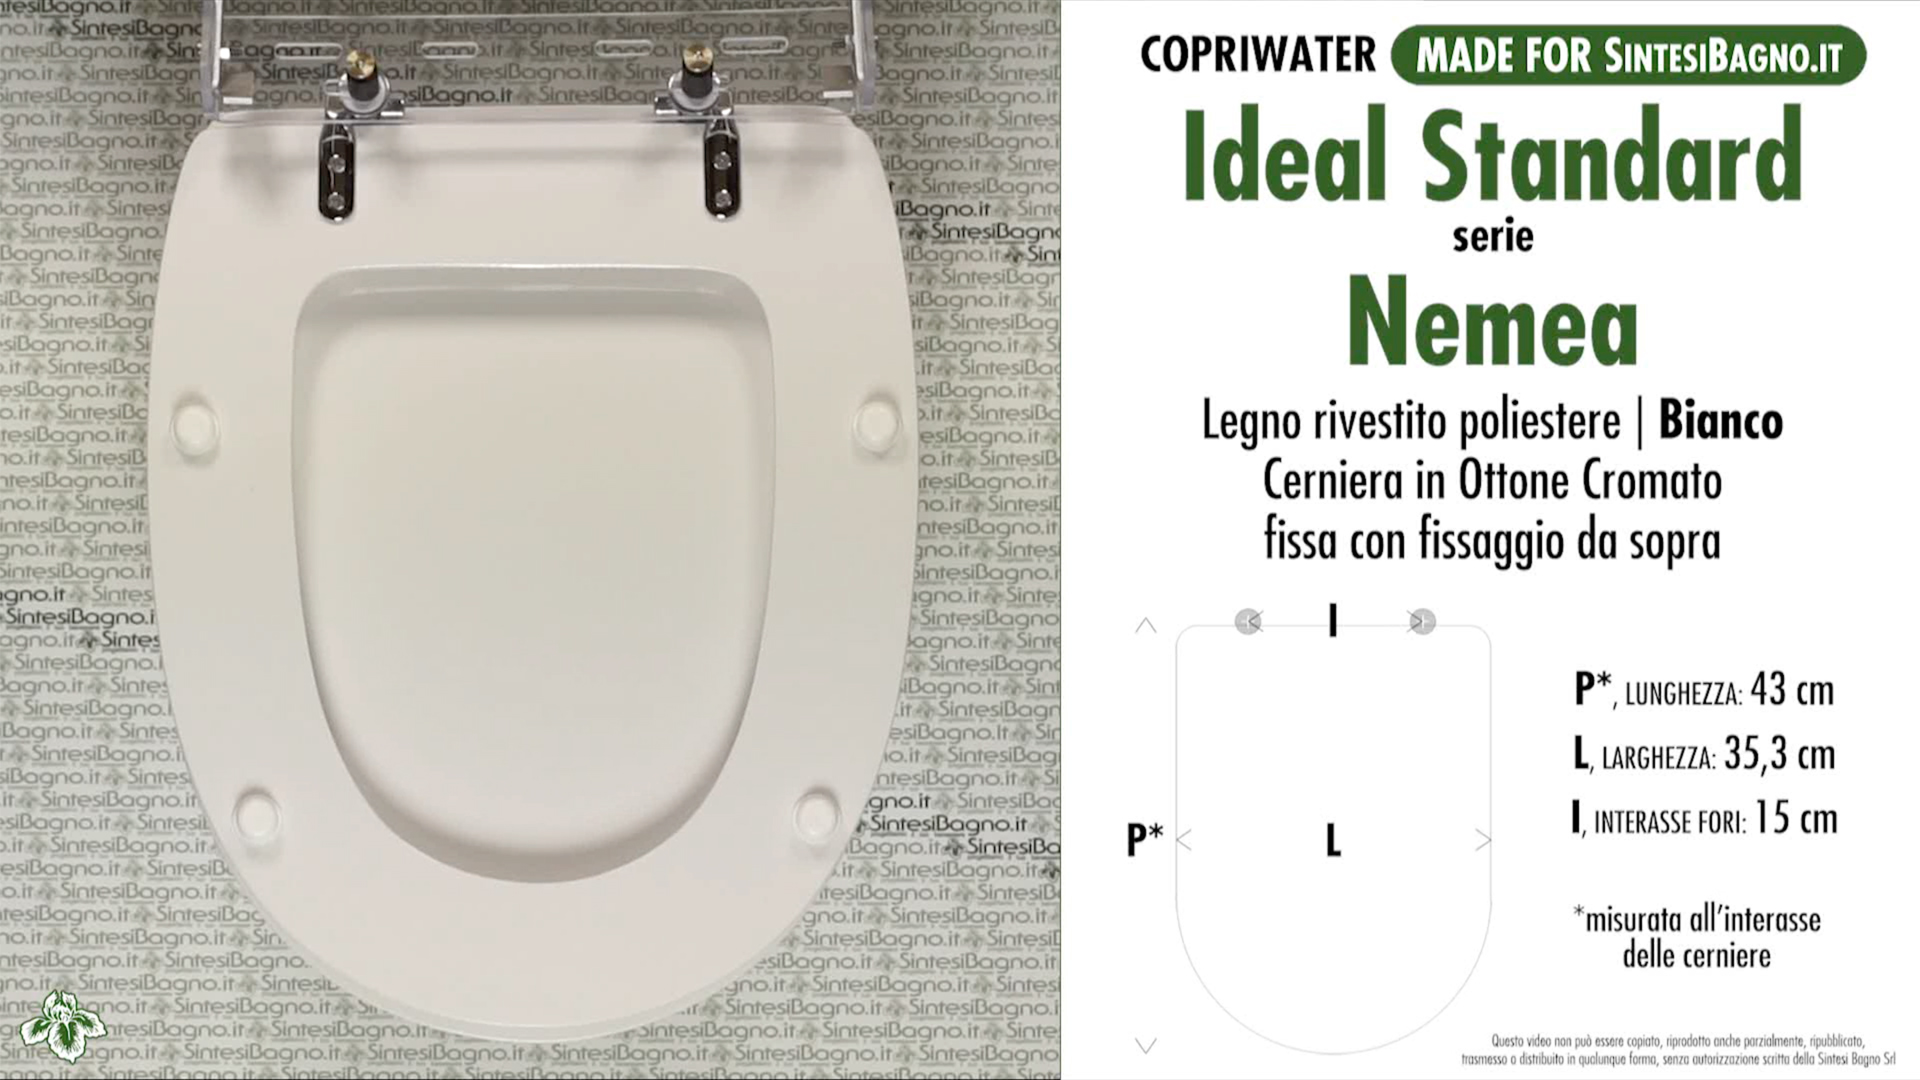 SCHEDA TECNICA MISURE copriwater IDEAL STANDARD NEMEA